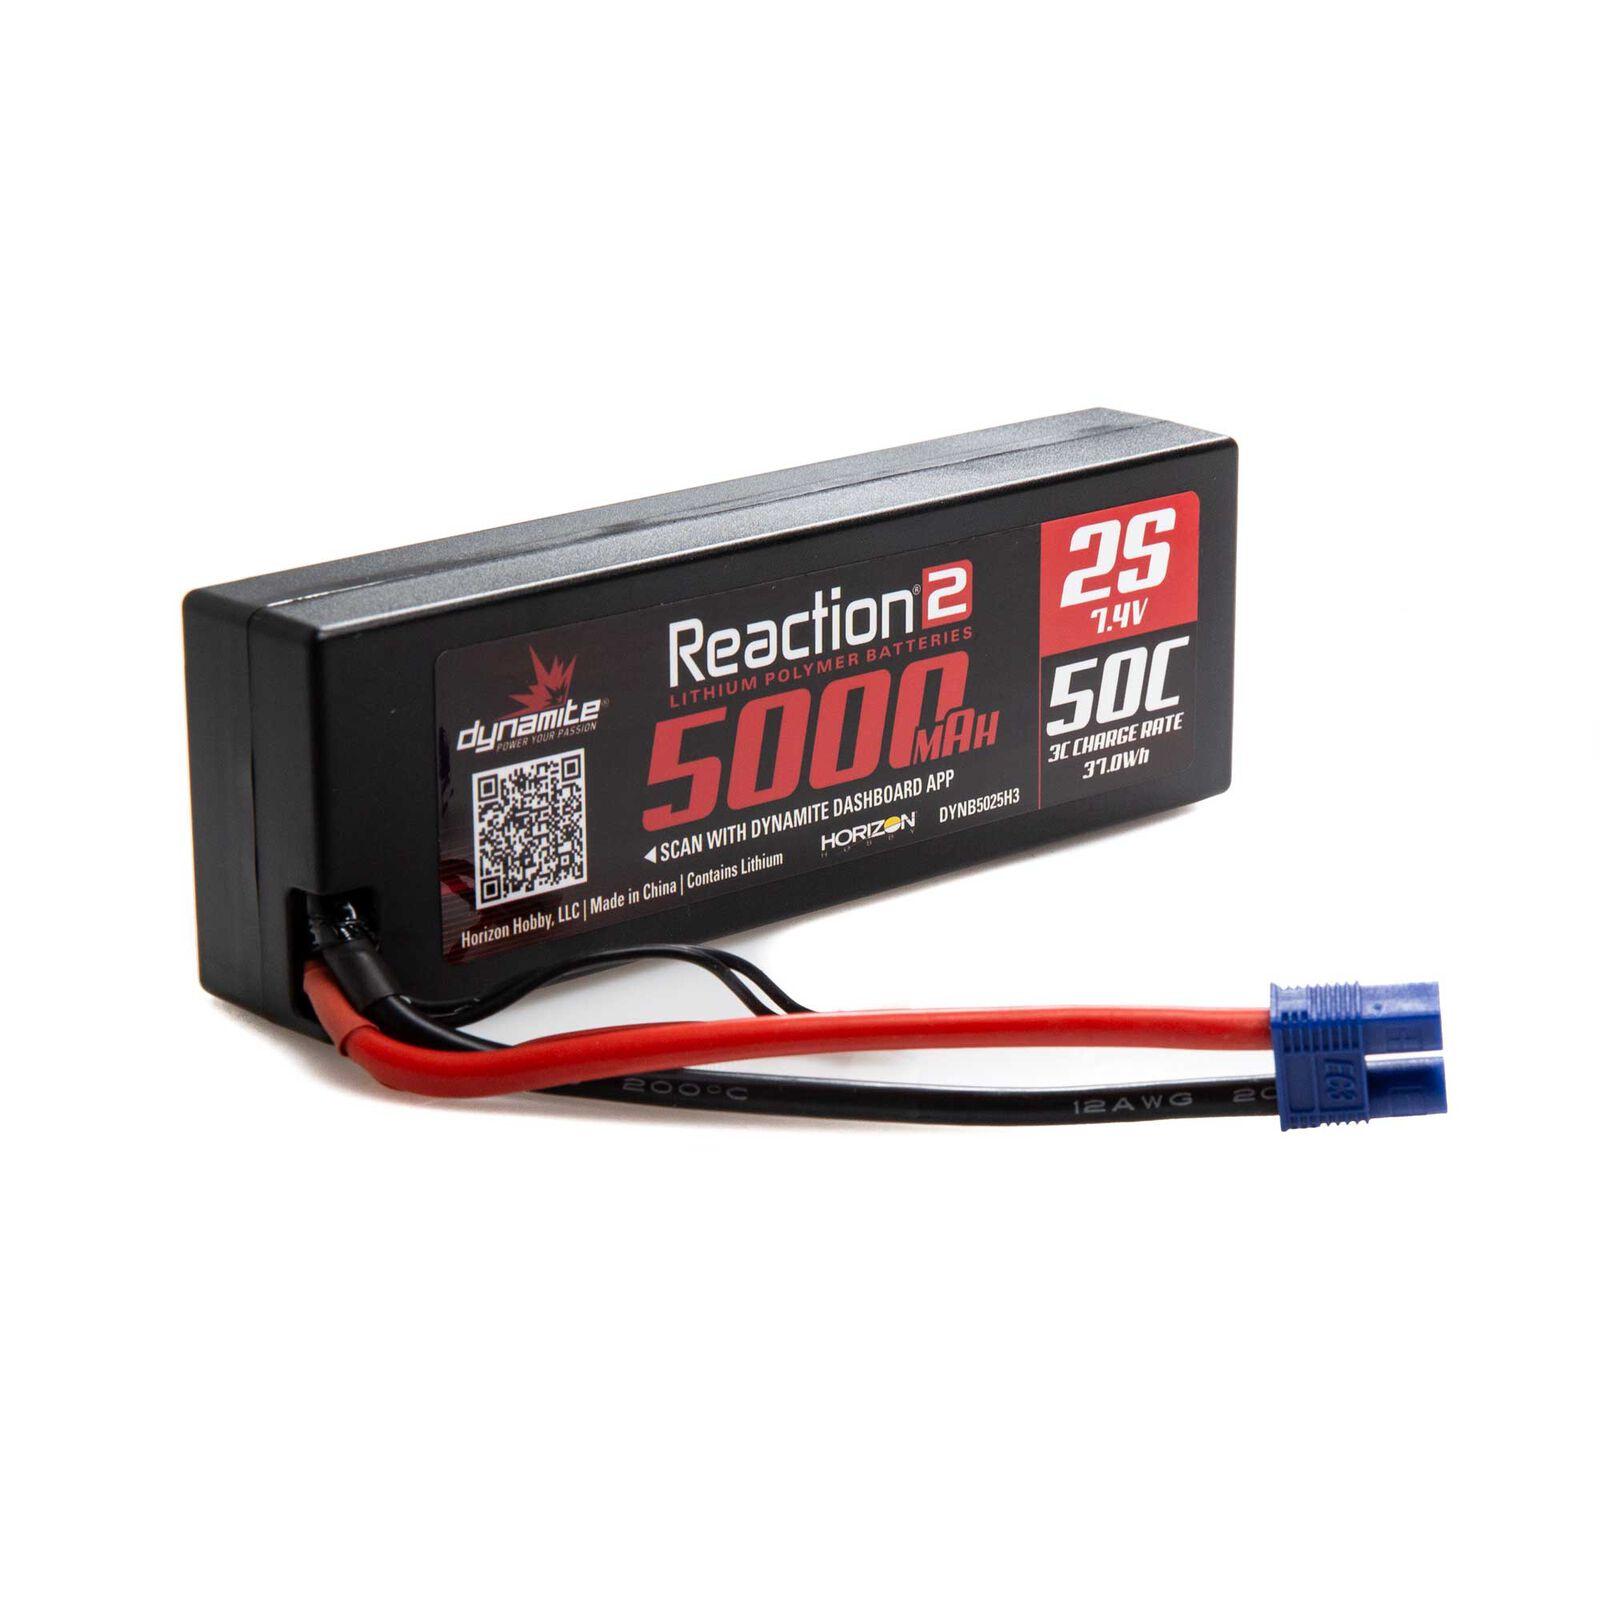 7.4V 5000mAh 2S 50C Reaction 2.0 Hardcase LiPo Battery: EC3